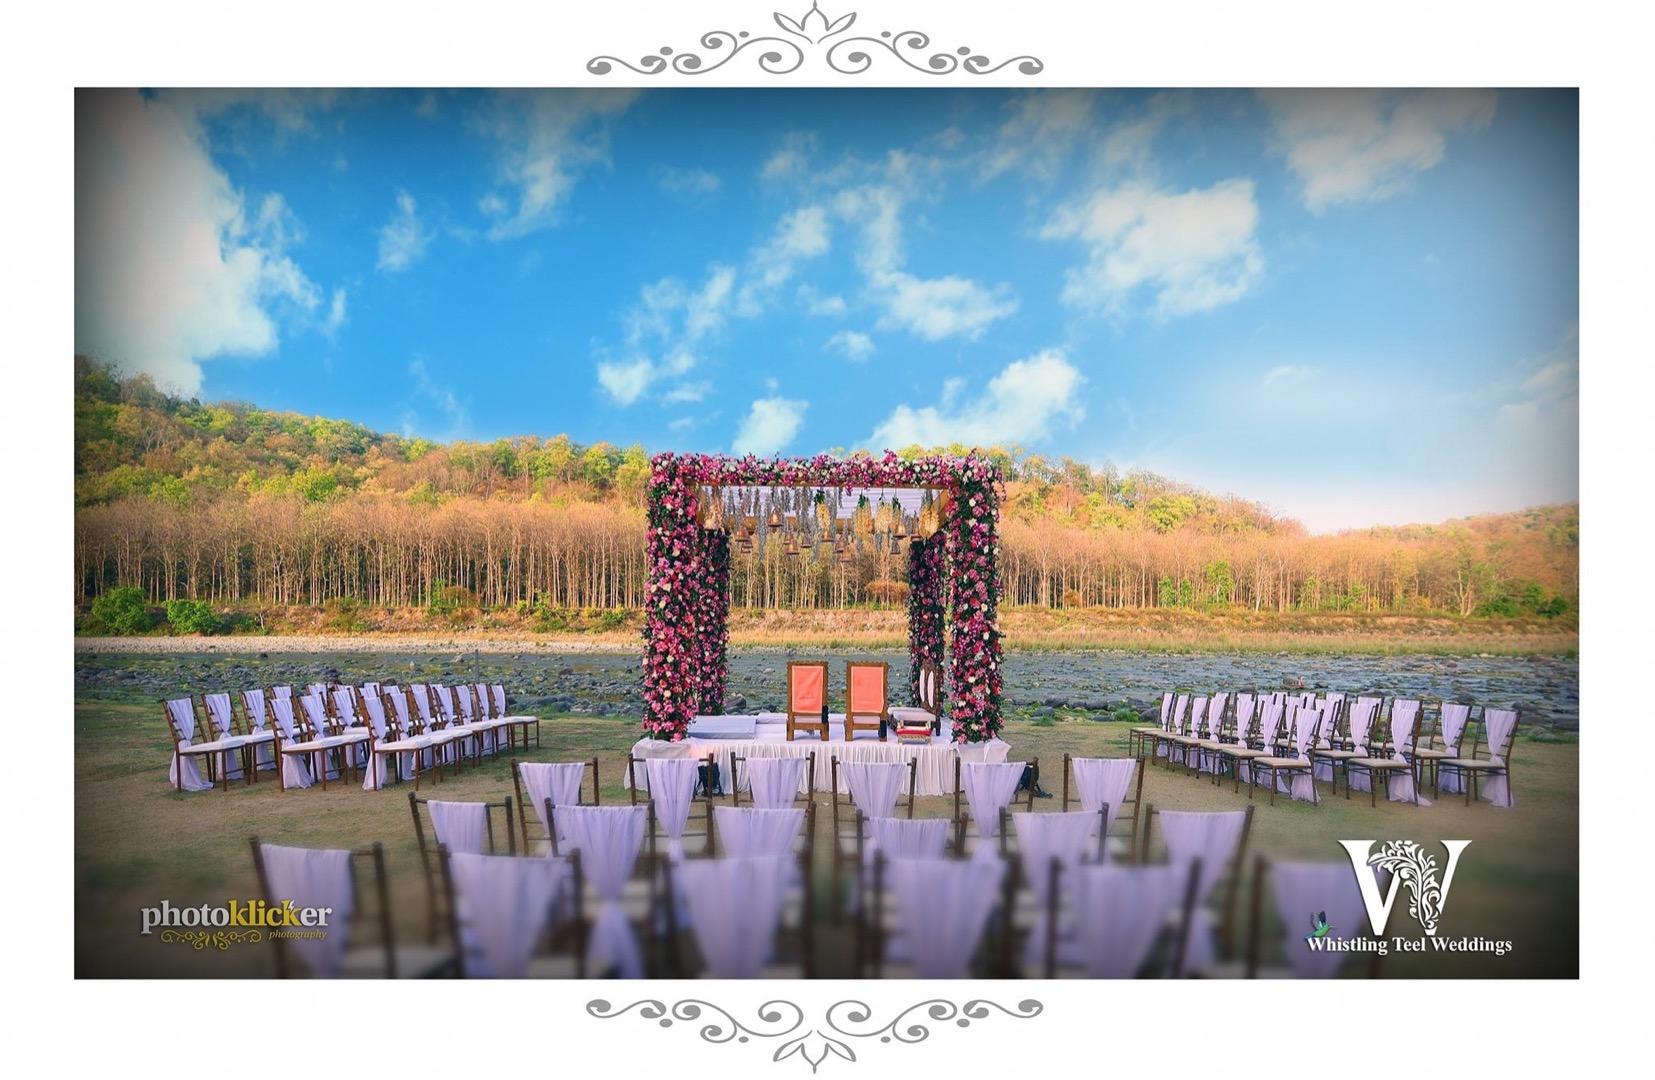 Beautiful destination wedding decor ideas